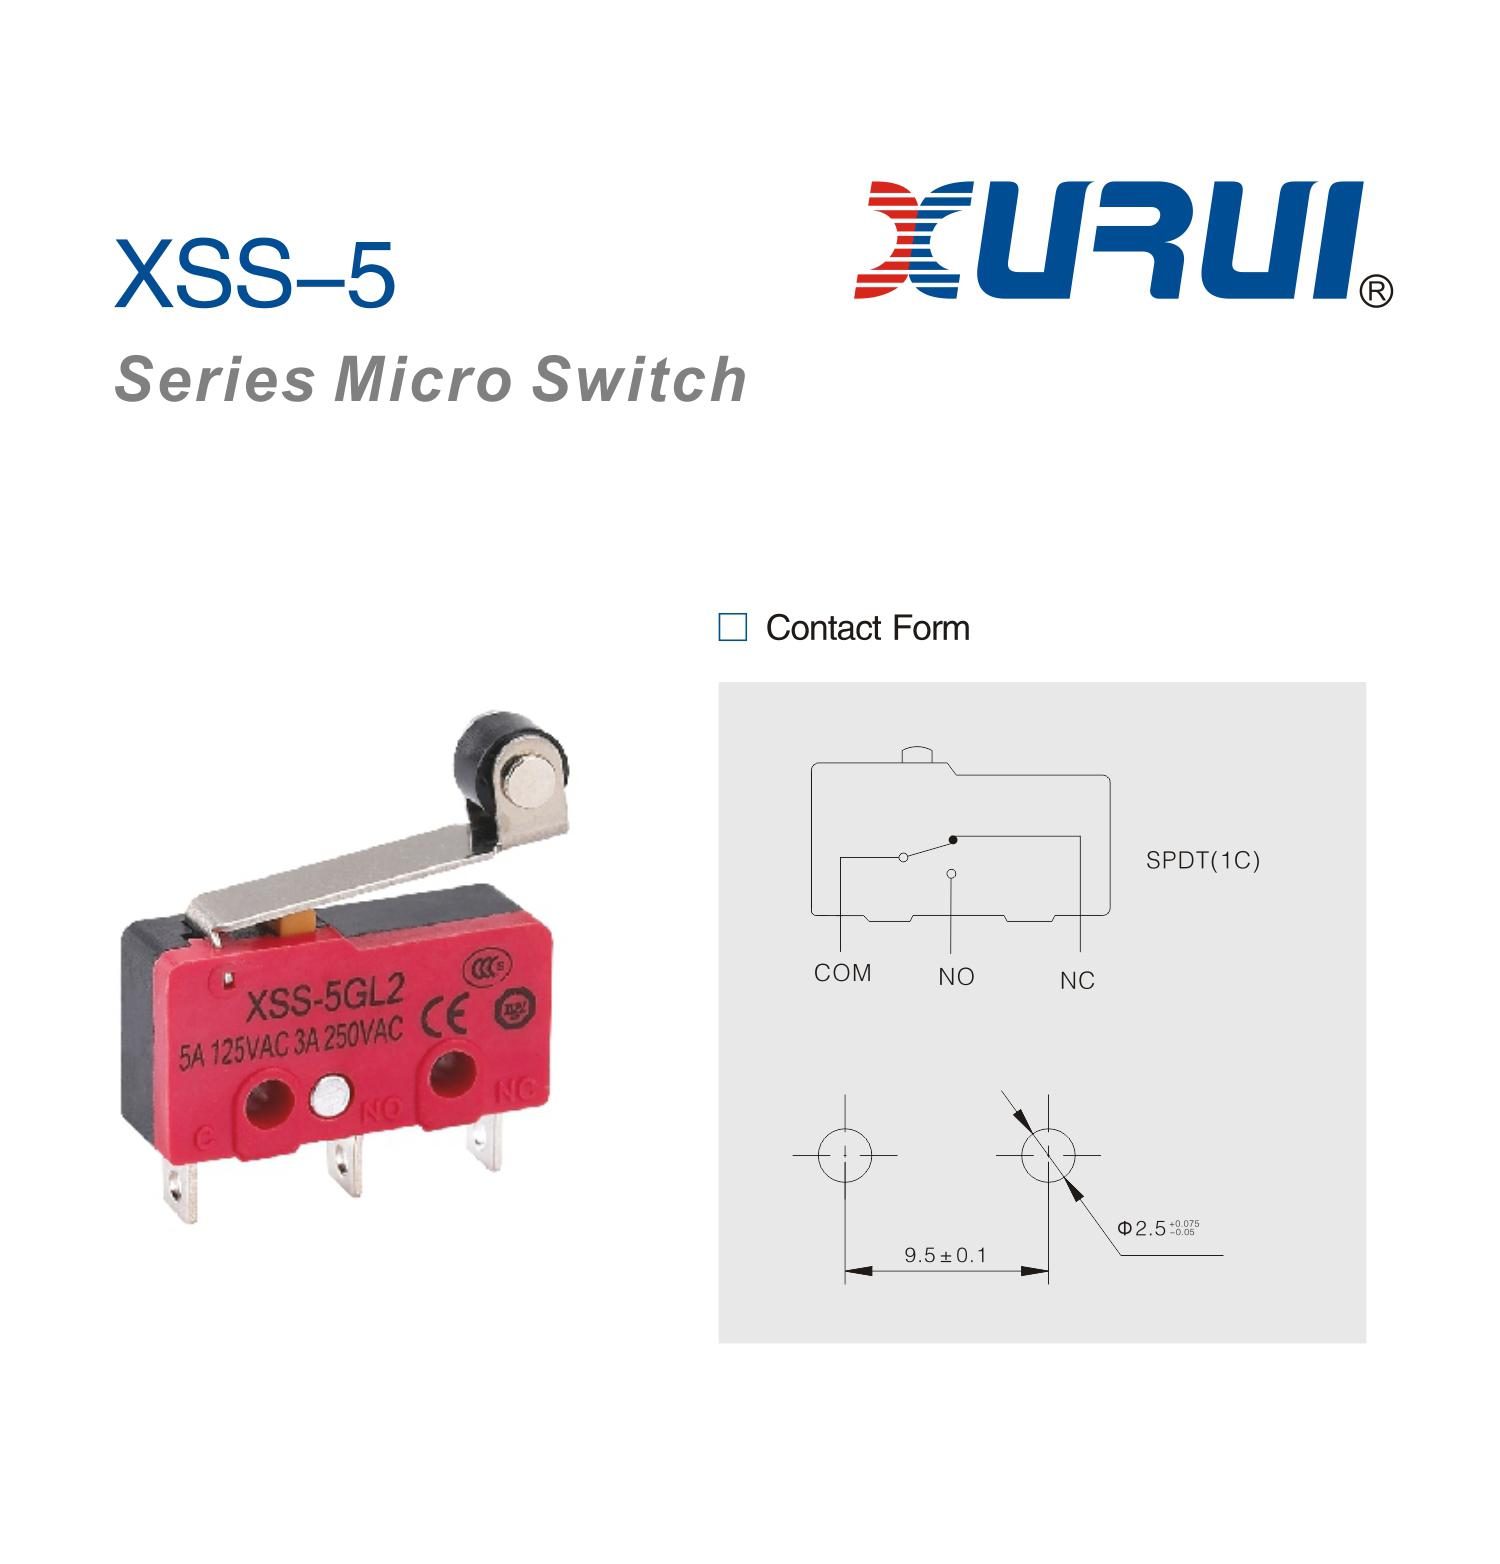 5x Endschalter Endstop Mircoswitch XSS-5GL2 Switch mechanisch RepRap ...